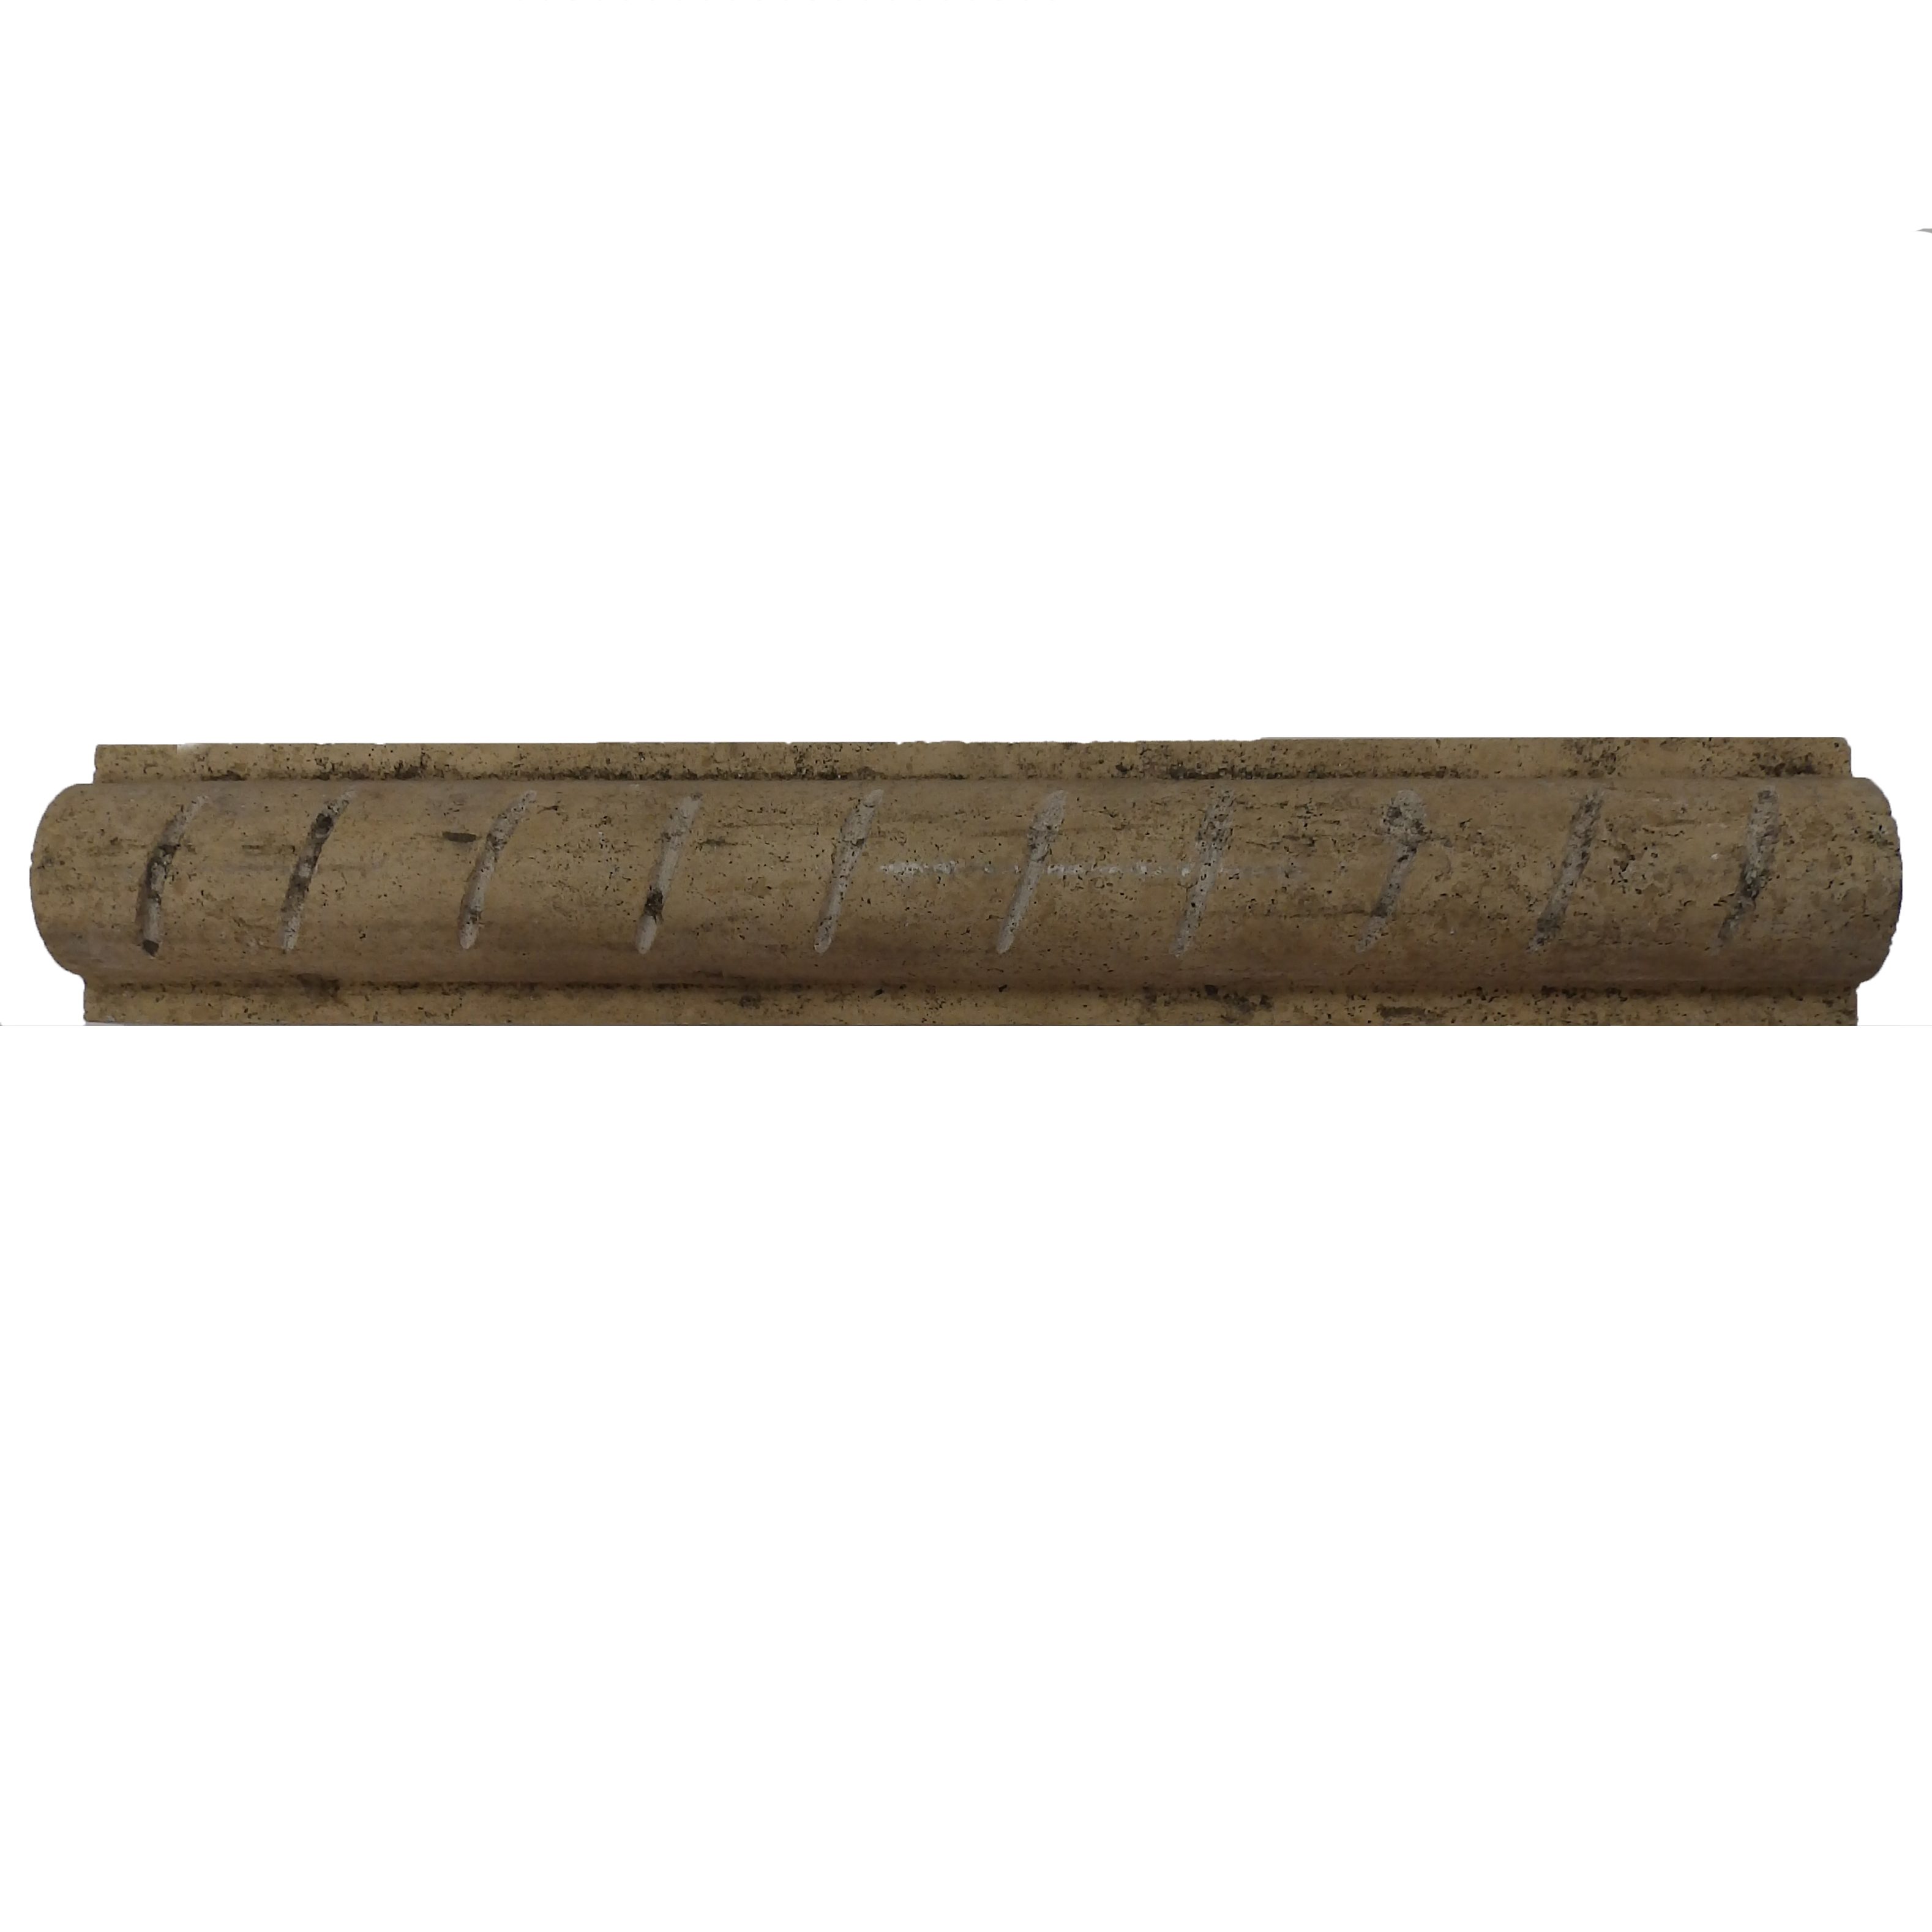 Item #6180 - Philadelphia Rustic Rope Travertine Molding Image